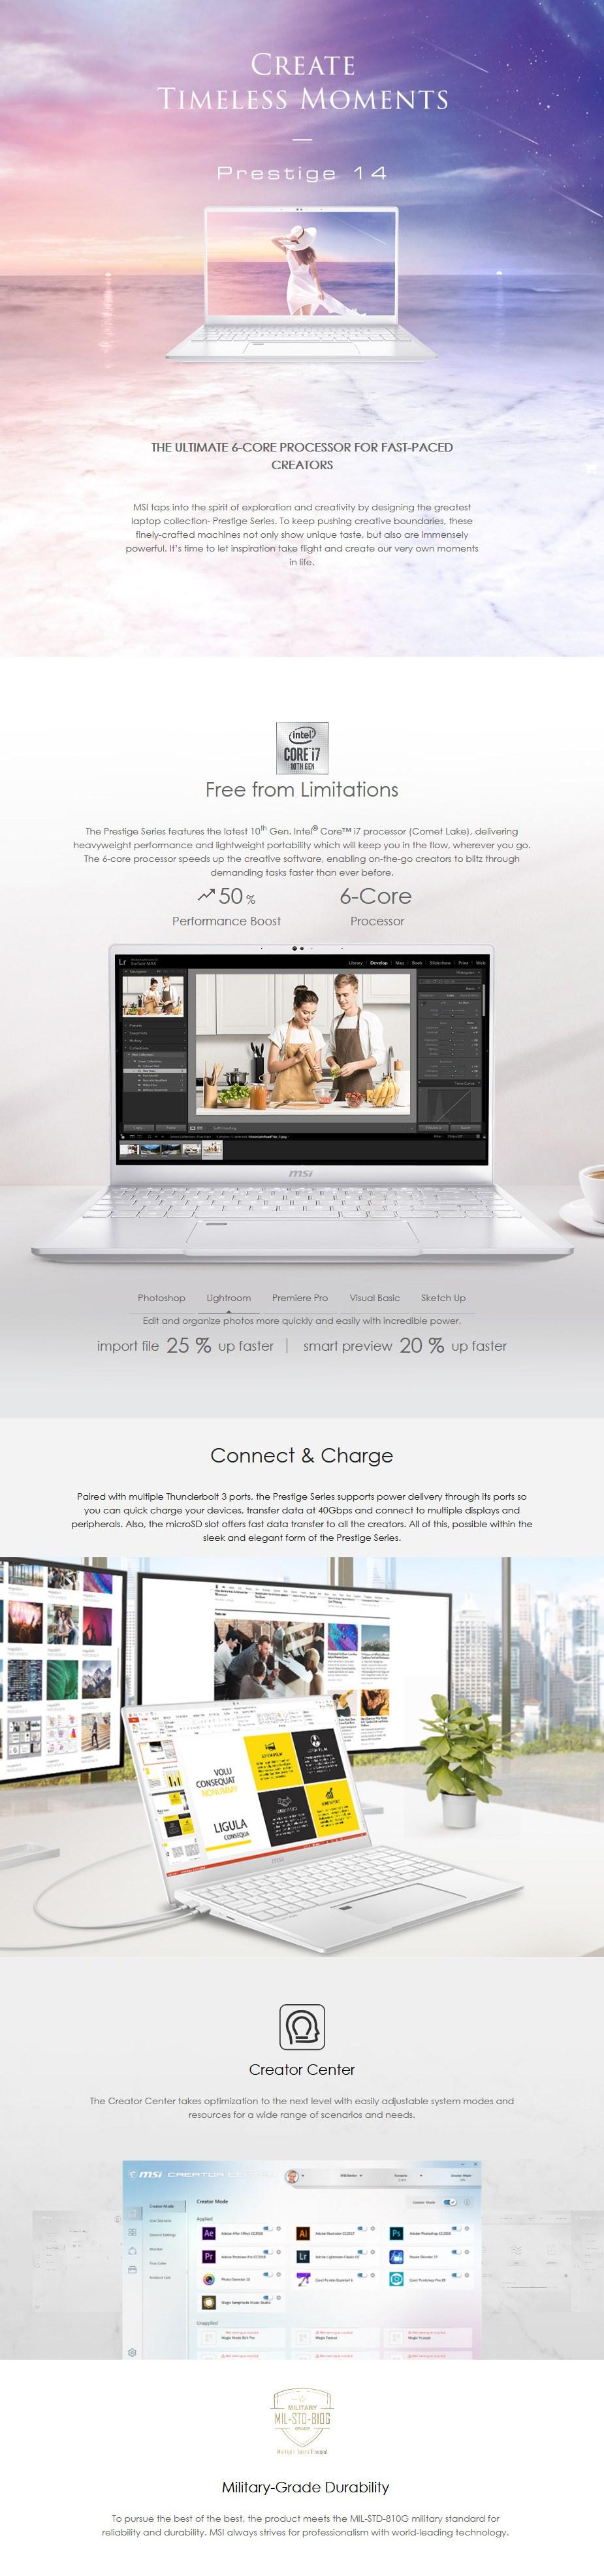 "MSI Prestige 14 A10RAS 14"" Laptop i7-10710U 16GB 512GB MX330 W10P - Pure White - Overview 1"